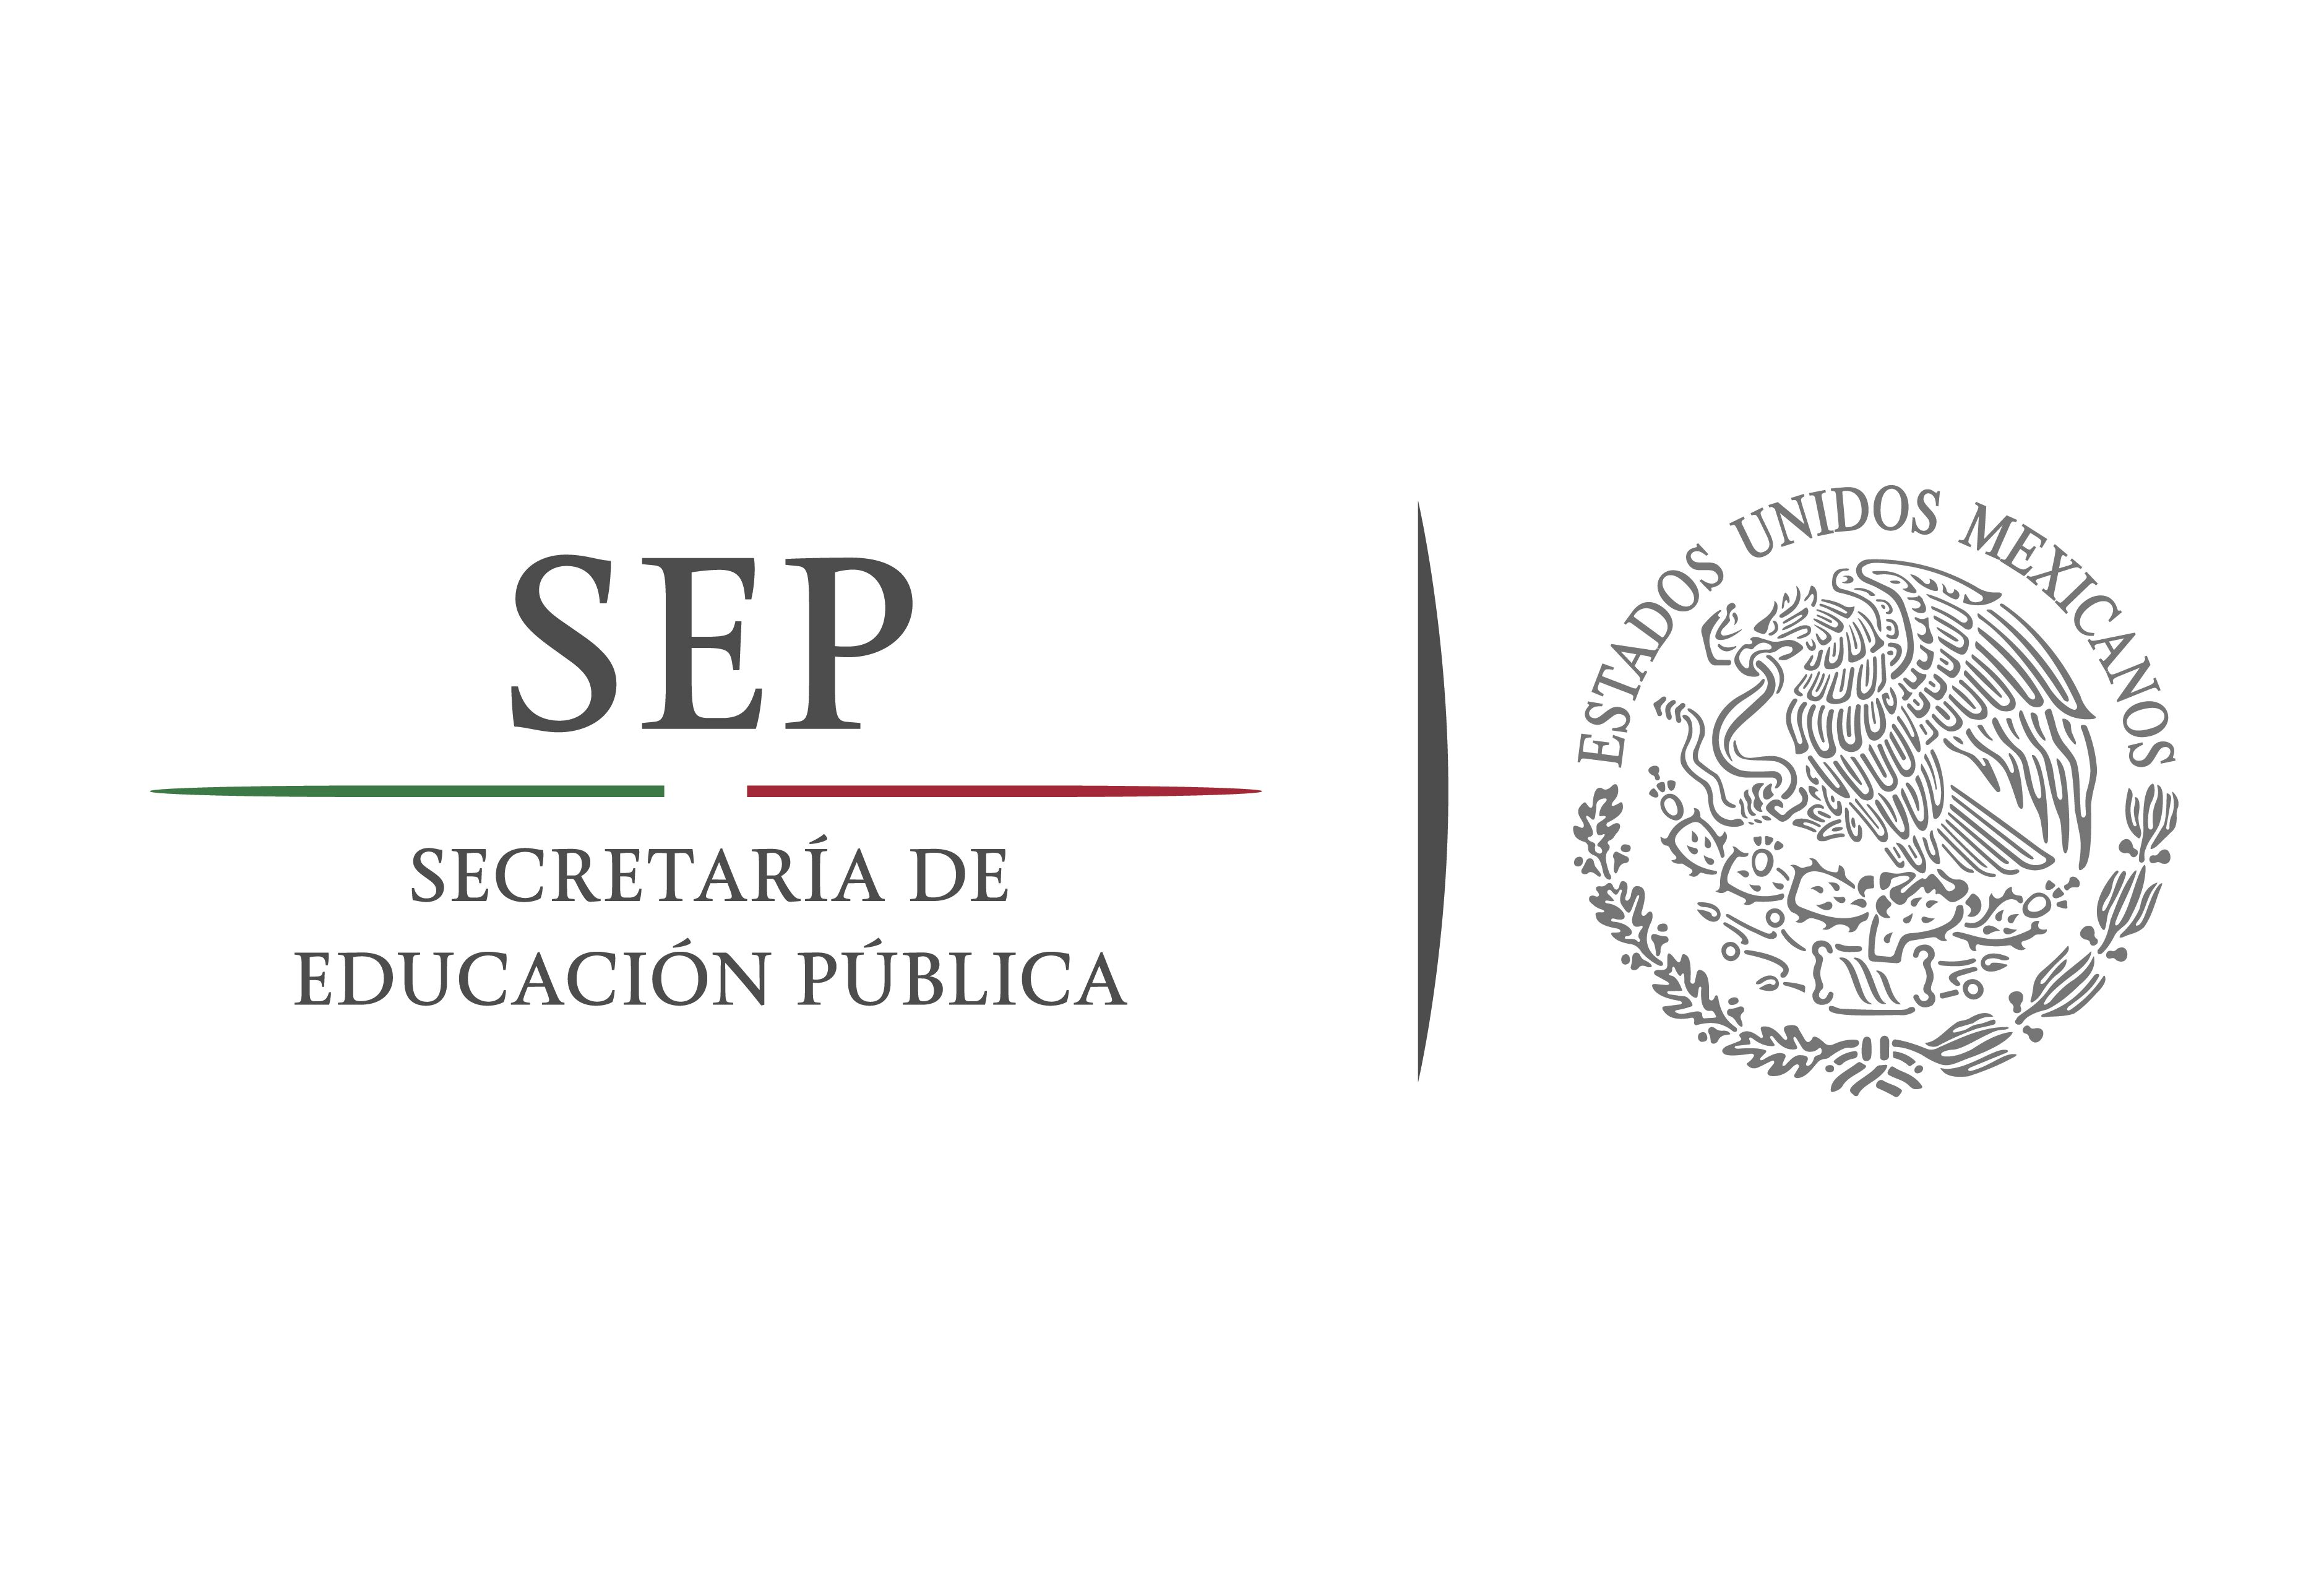 Chiapas dice s a la evaluaci ndeldesempe o secretar a for Ministerio de gobernacion